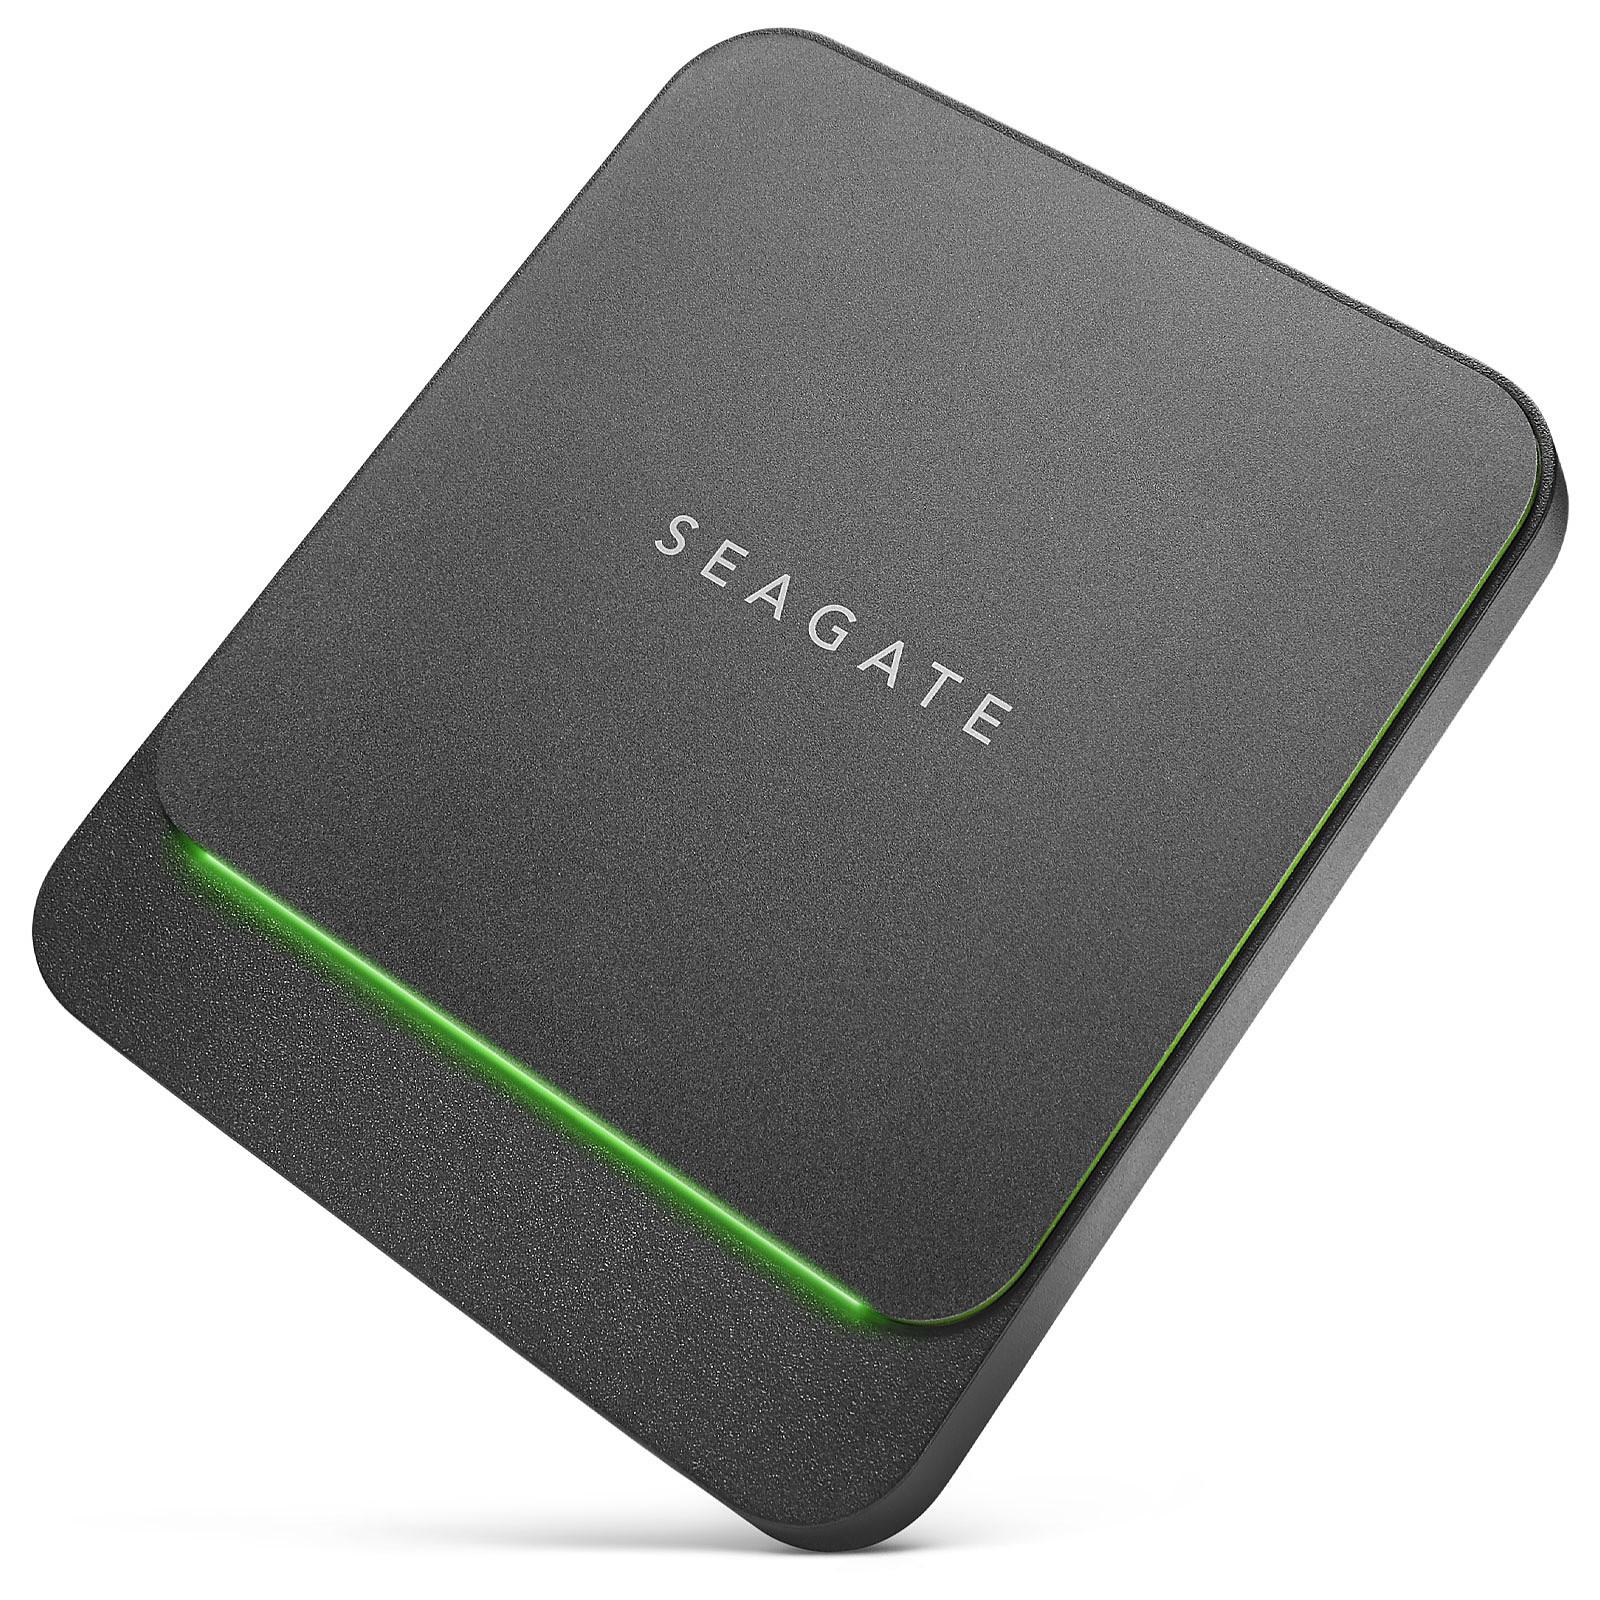 Seagate BarraCuda Fast SSD 2 To - Disque dur externe Seagate Technology sur  LDLC.com